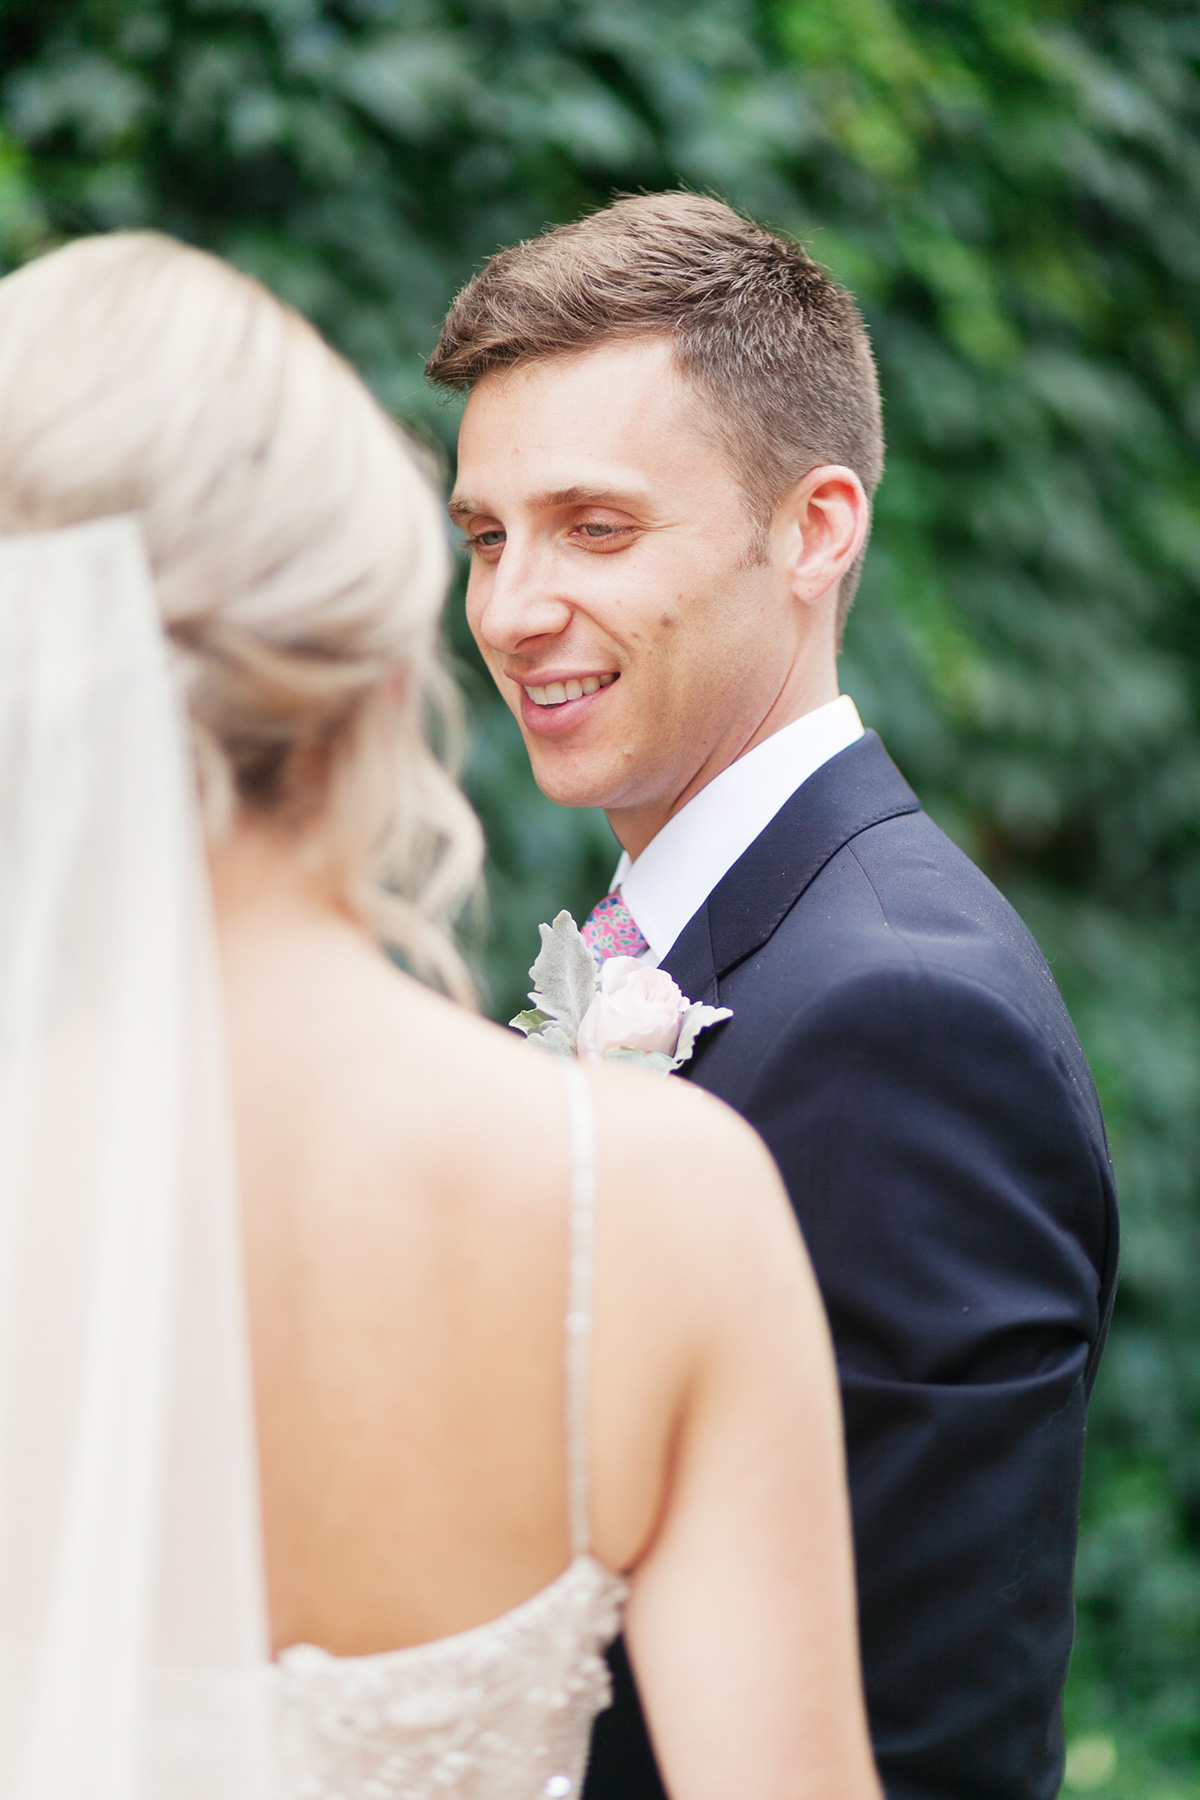 jennifer-xu-photography-vineyard-bride-swish-list-spice-factory-hamilton-wedding-3.jpg